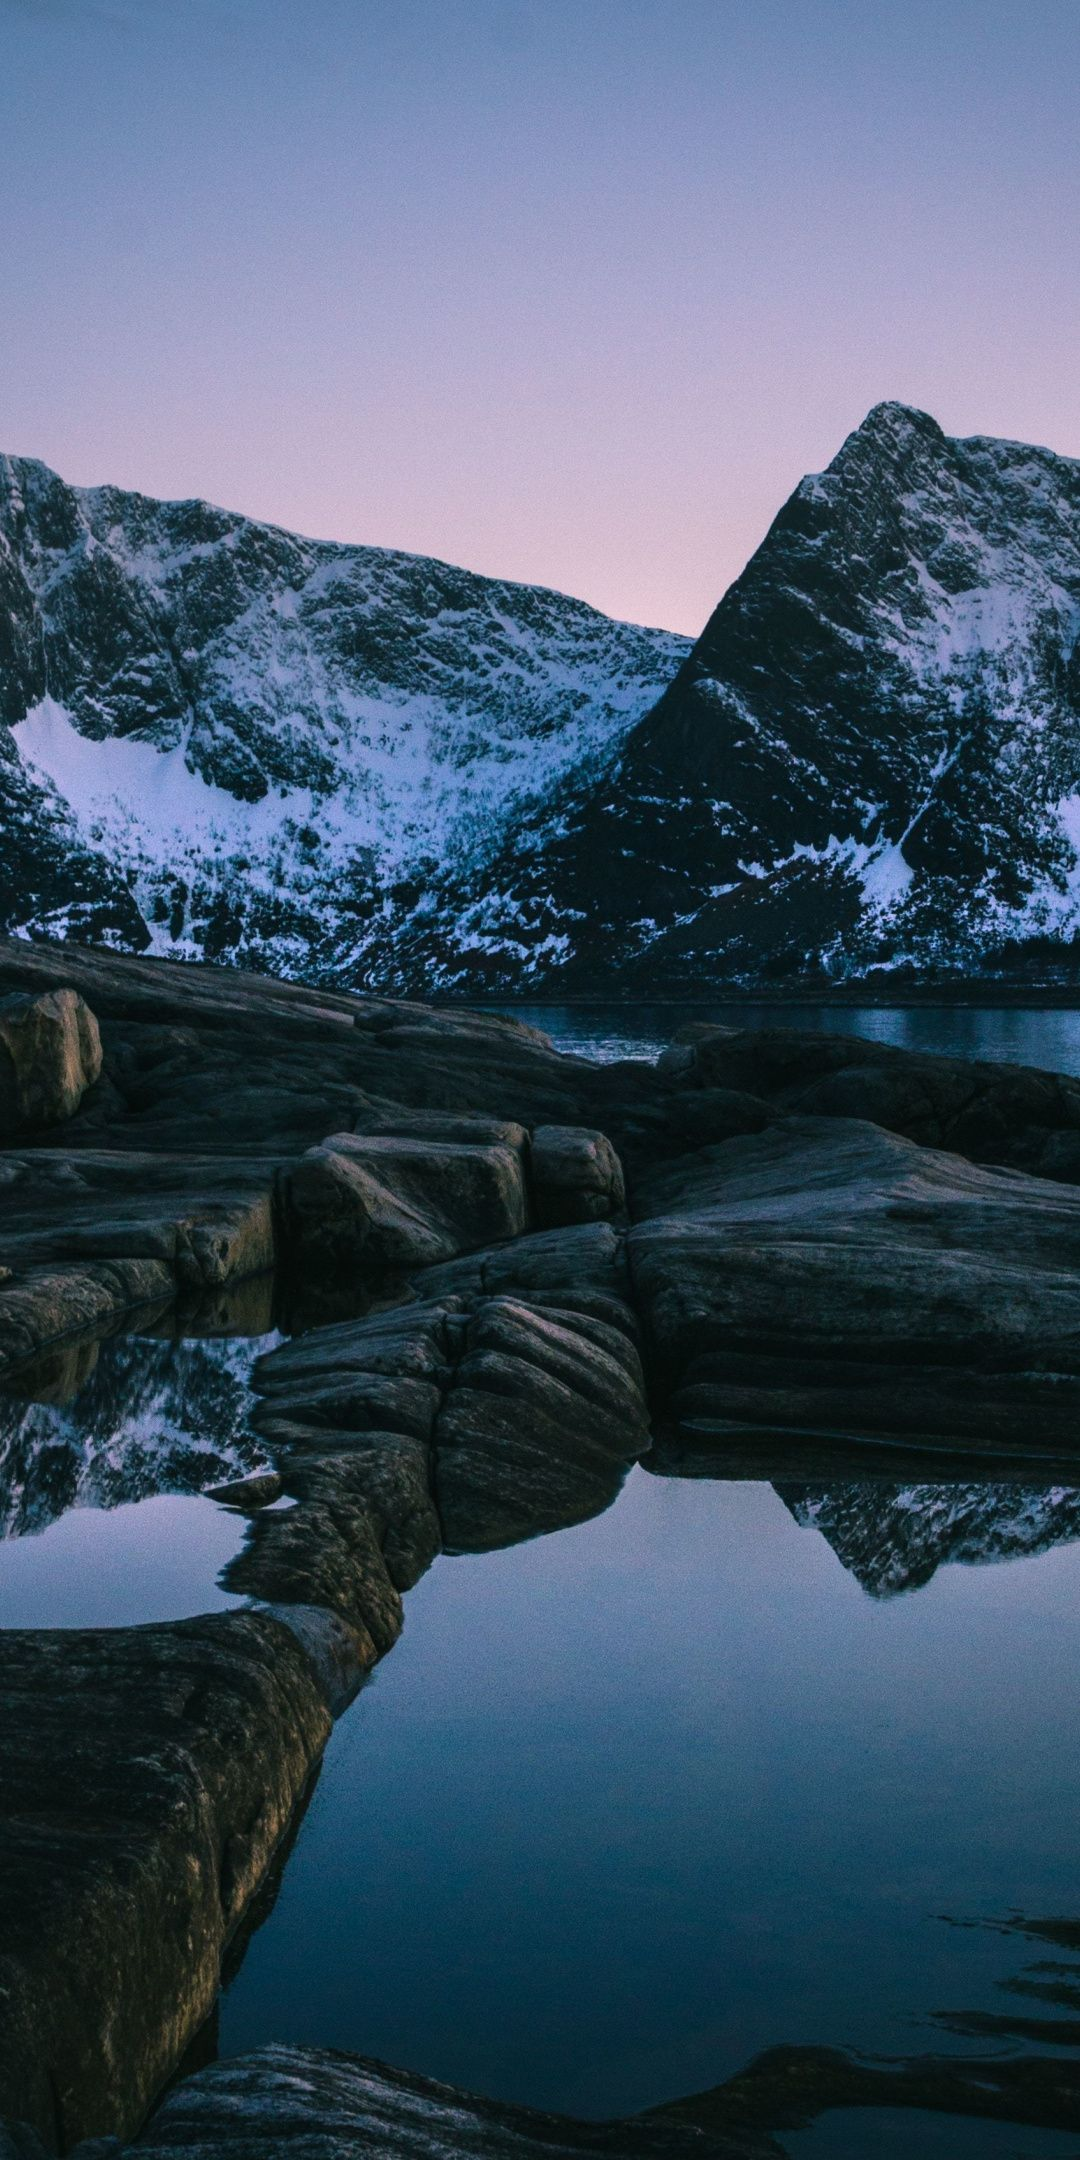 Evening, sunset, lake, mountain, nature, 1080x2160 wallpaper | Nature, Natural Wallpapers in 2019 | Norway wallpaper, Mountain wallpaper, Wallpaper